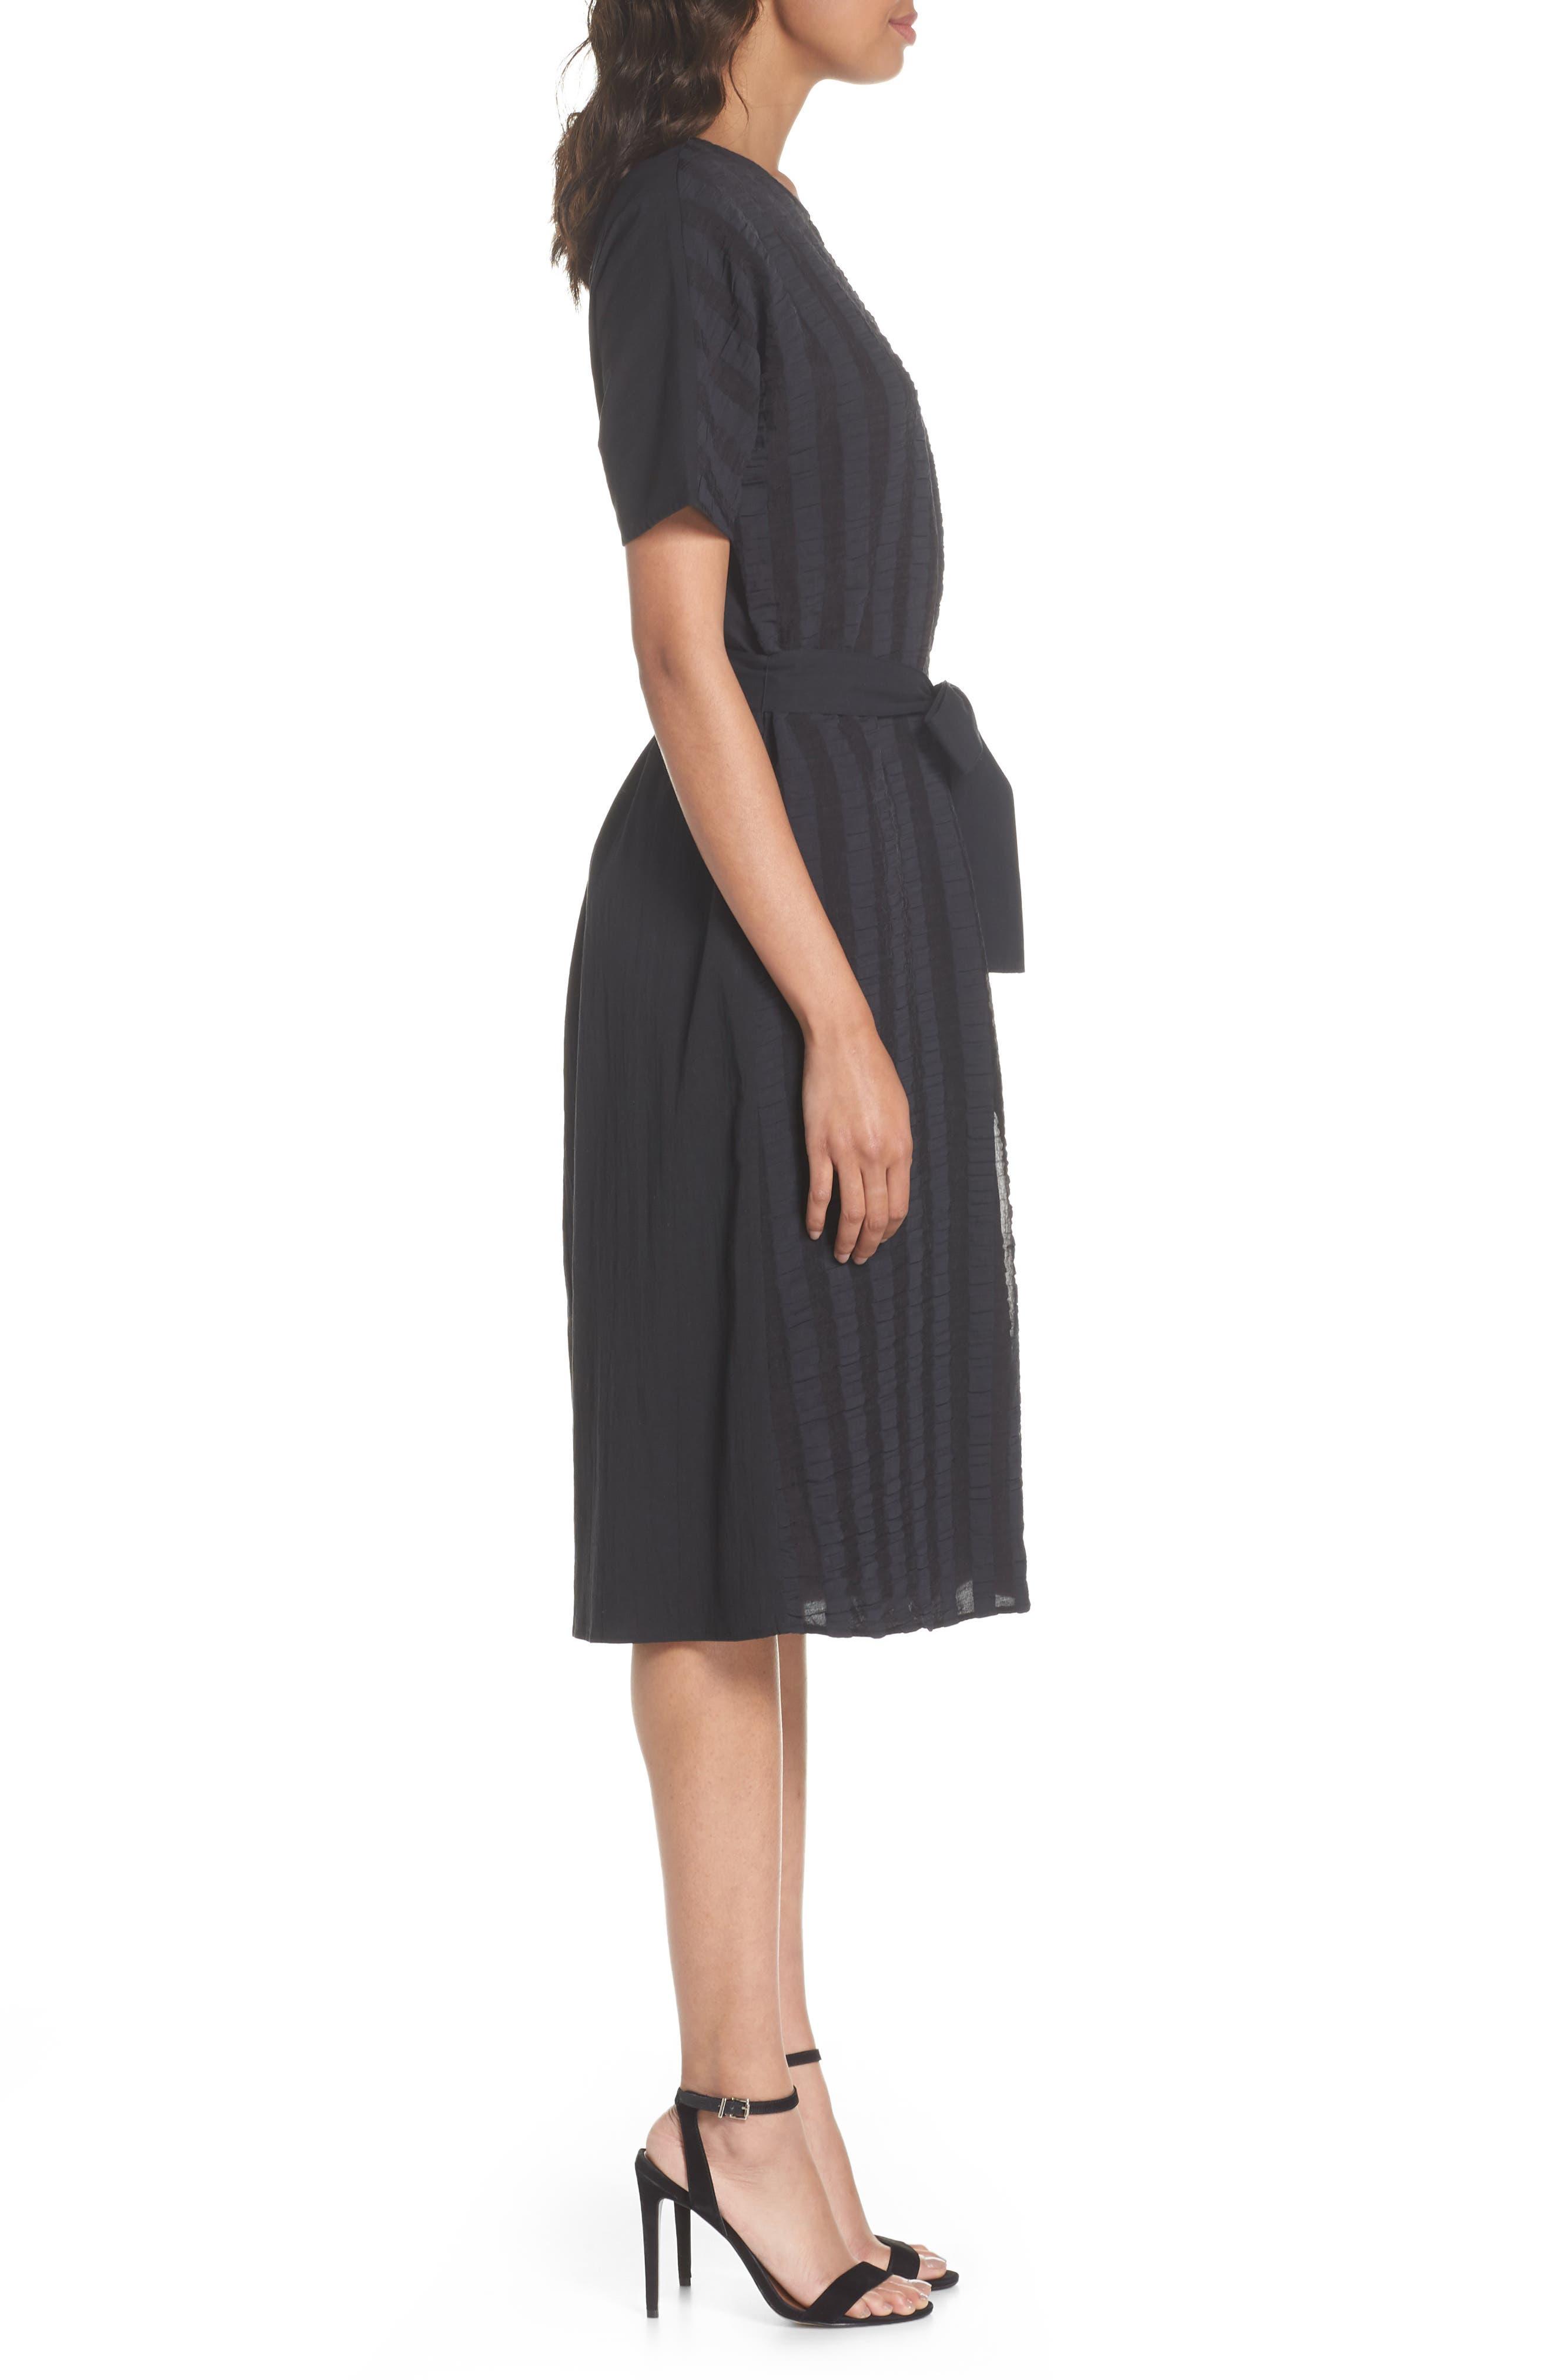 Throwing Shade Midi Dress,                             Alternate thumbnail 3, color,                             Black